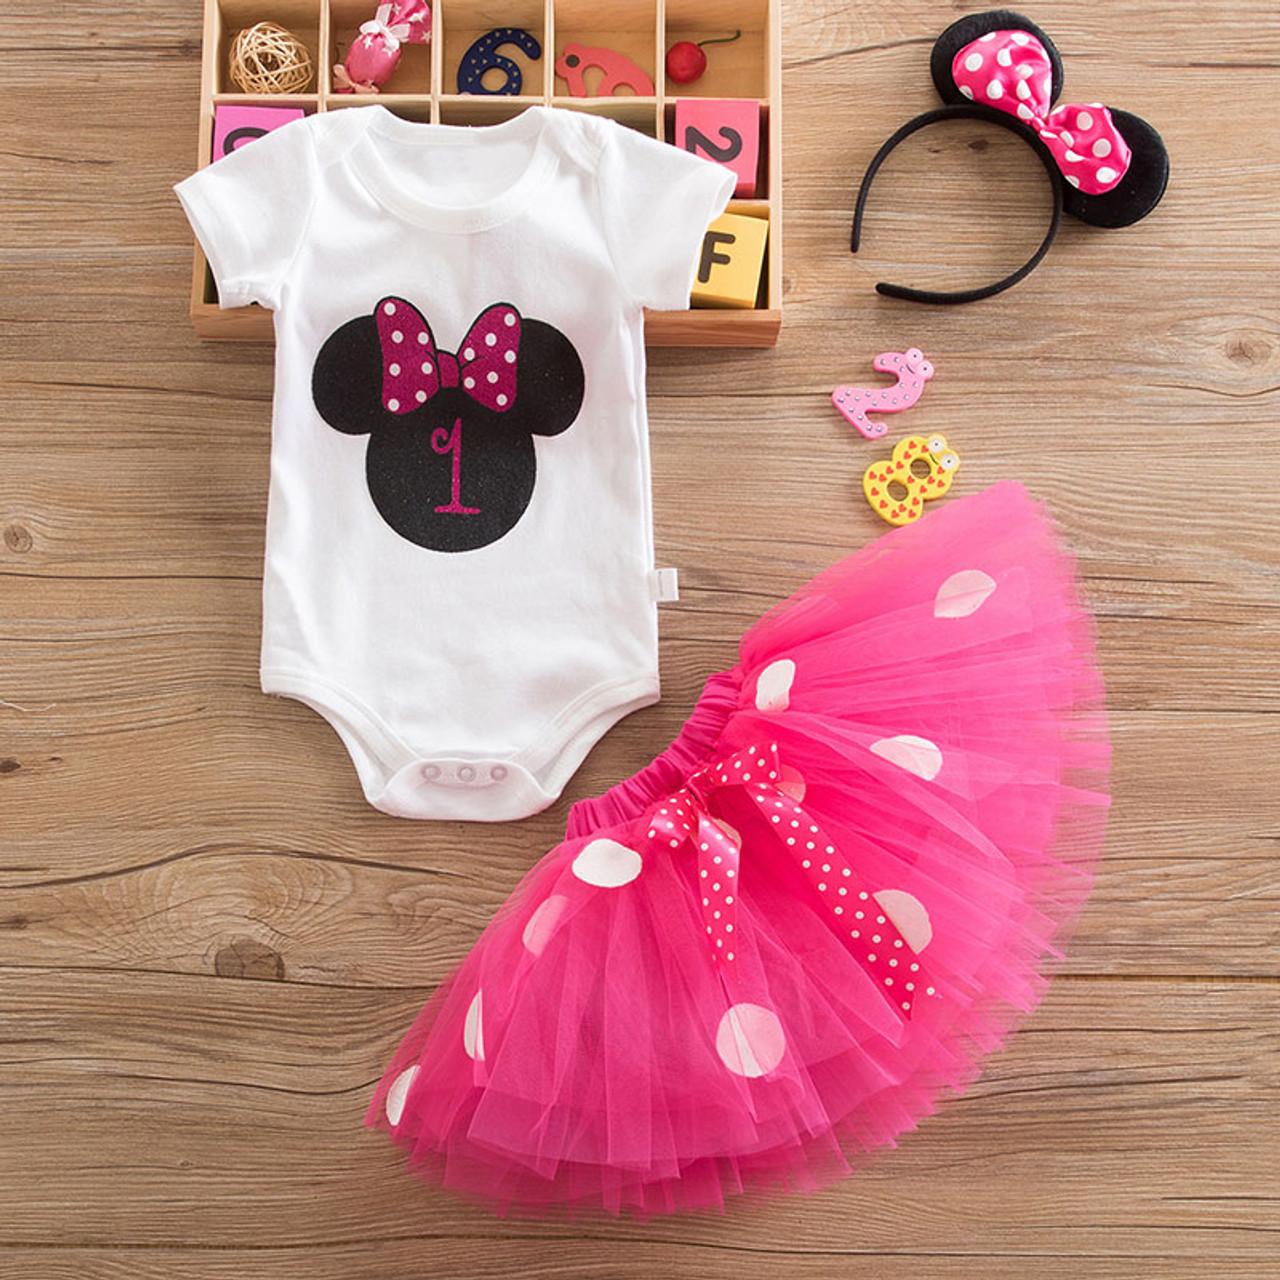 898932a5f Minnie Mouse Hot Pink 1st Birthday tutu set - Light of Mine Clothing